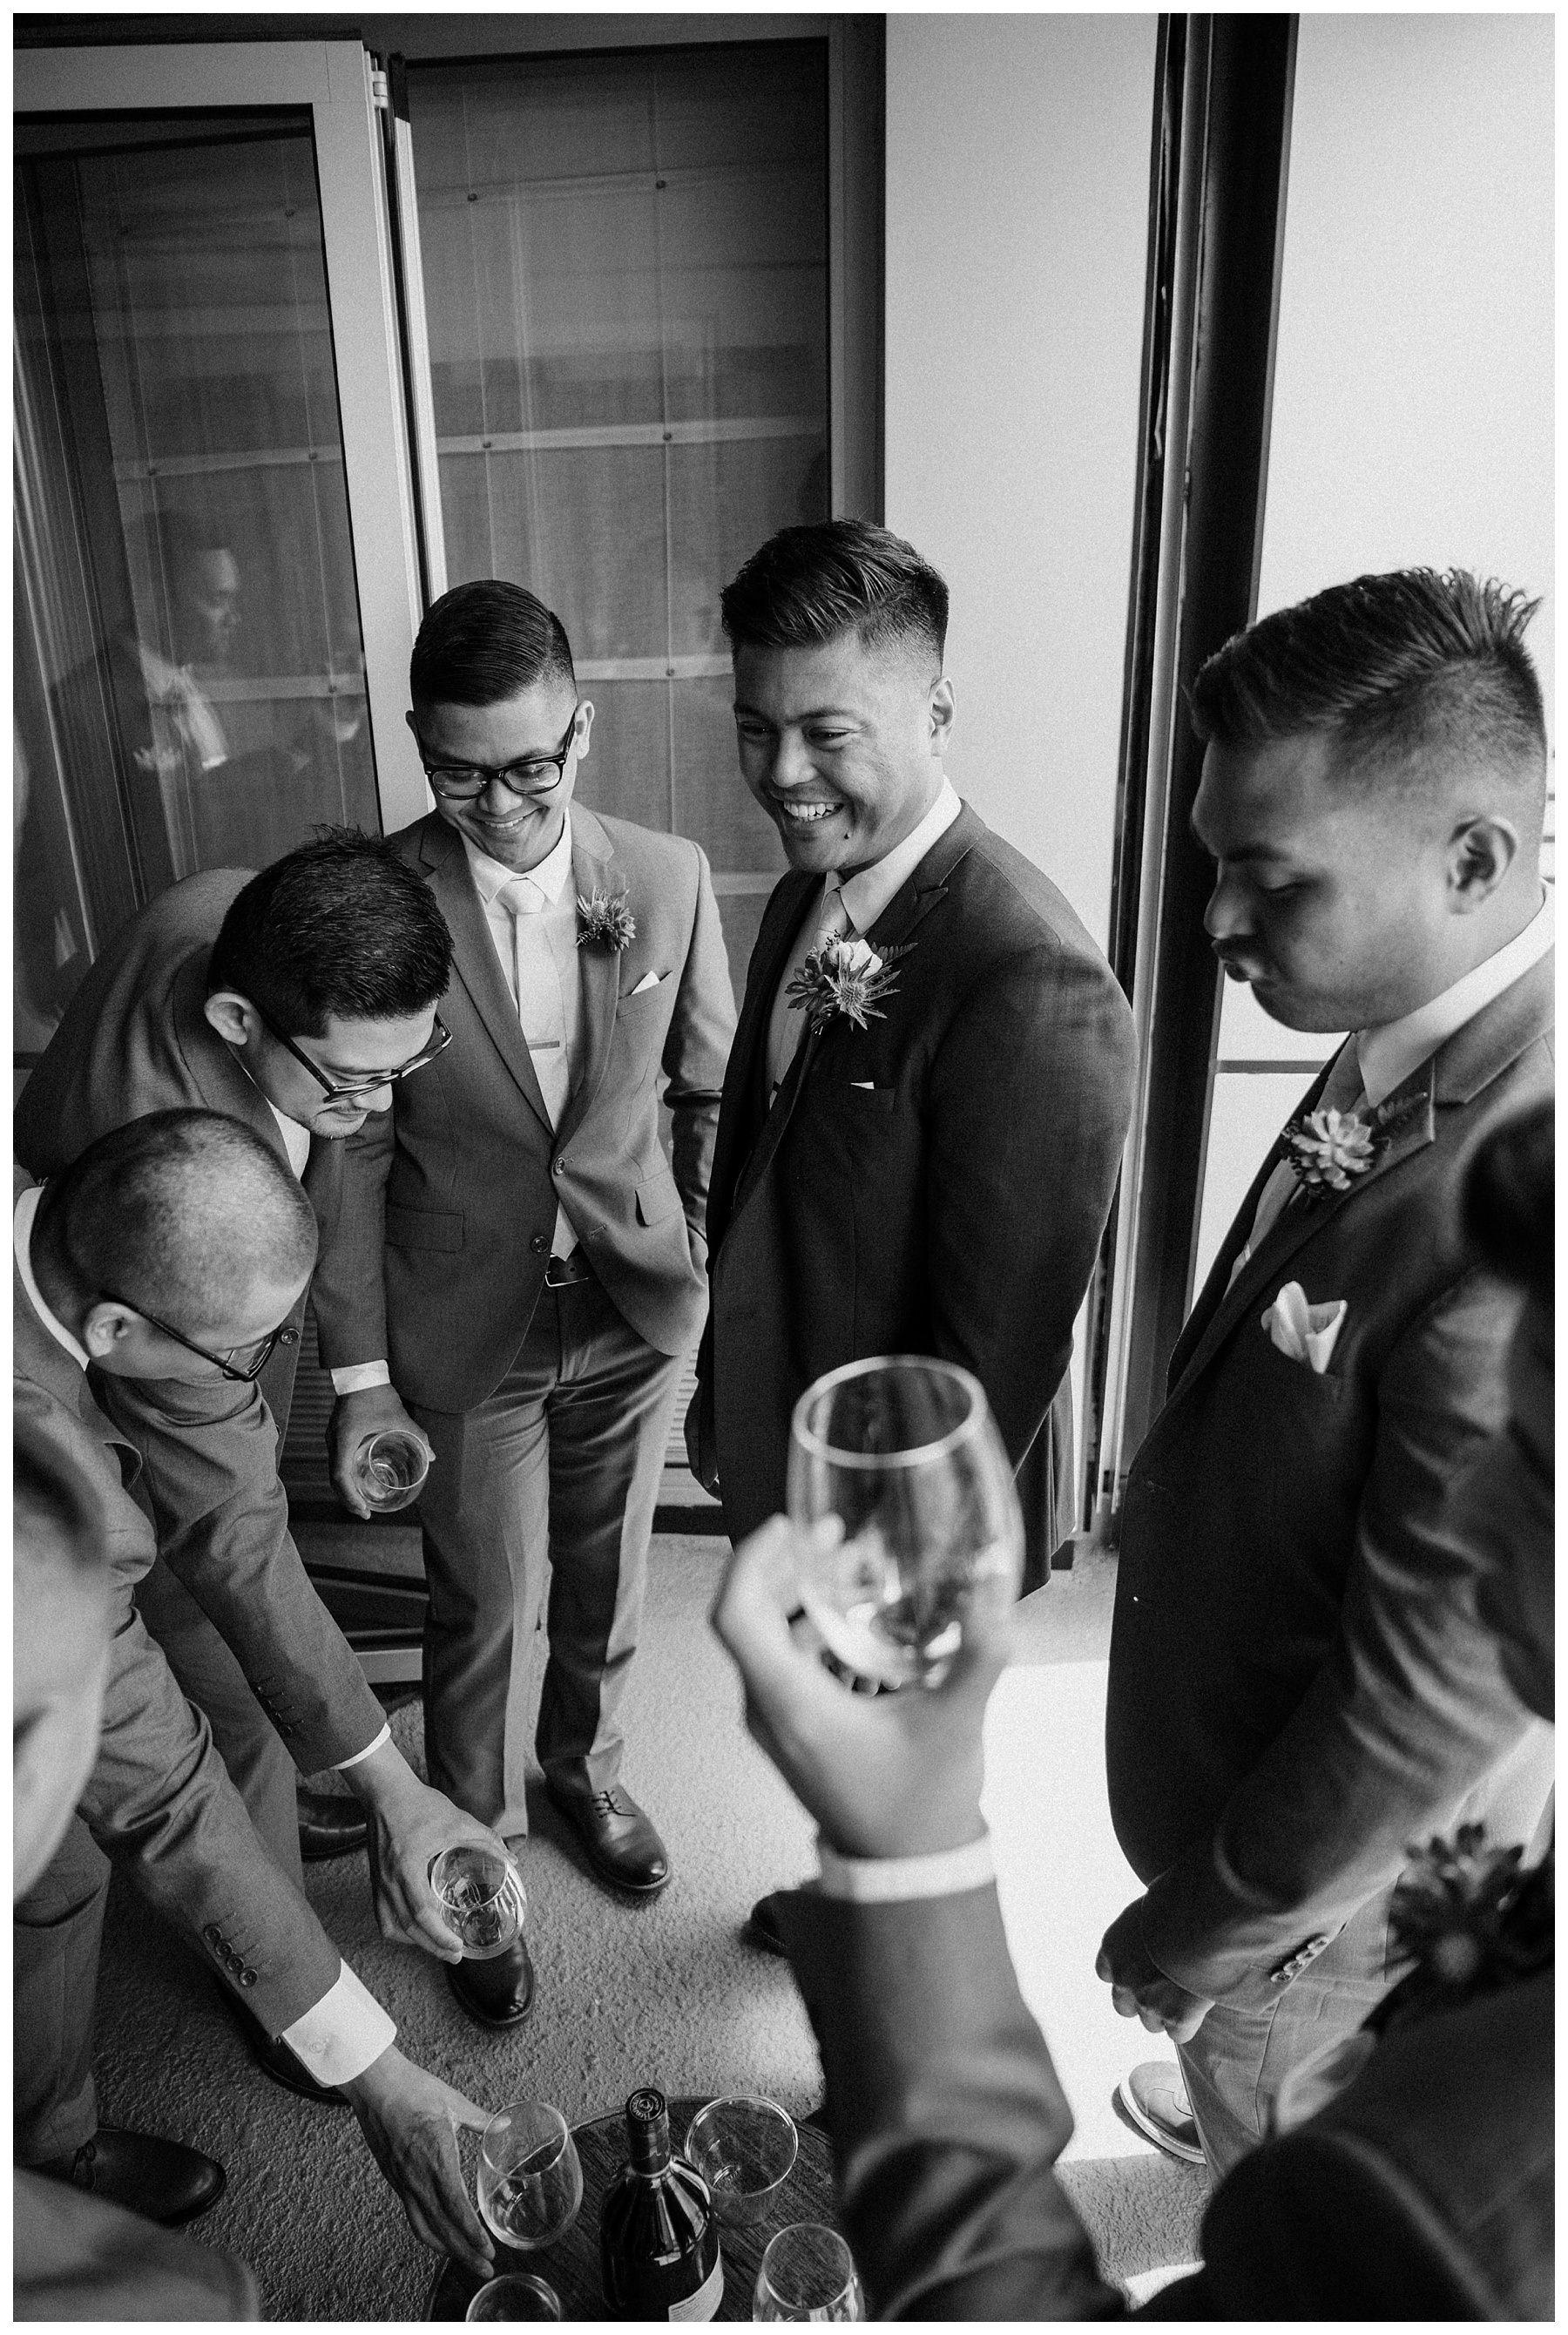 Brick_San_Diego_wedding_0014.jpg